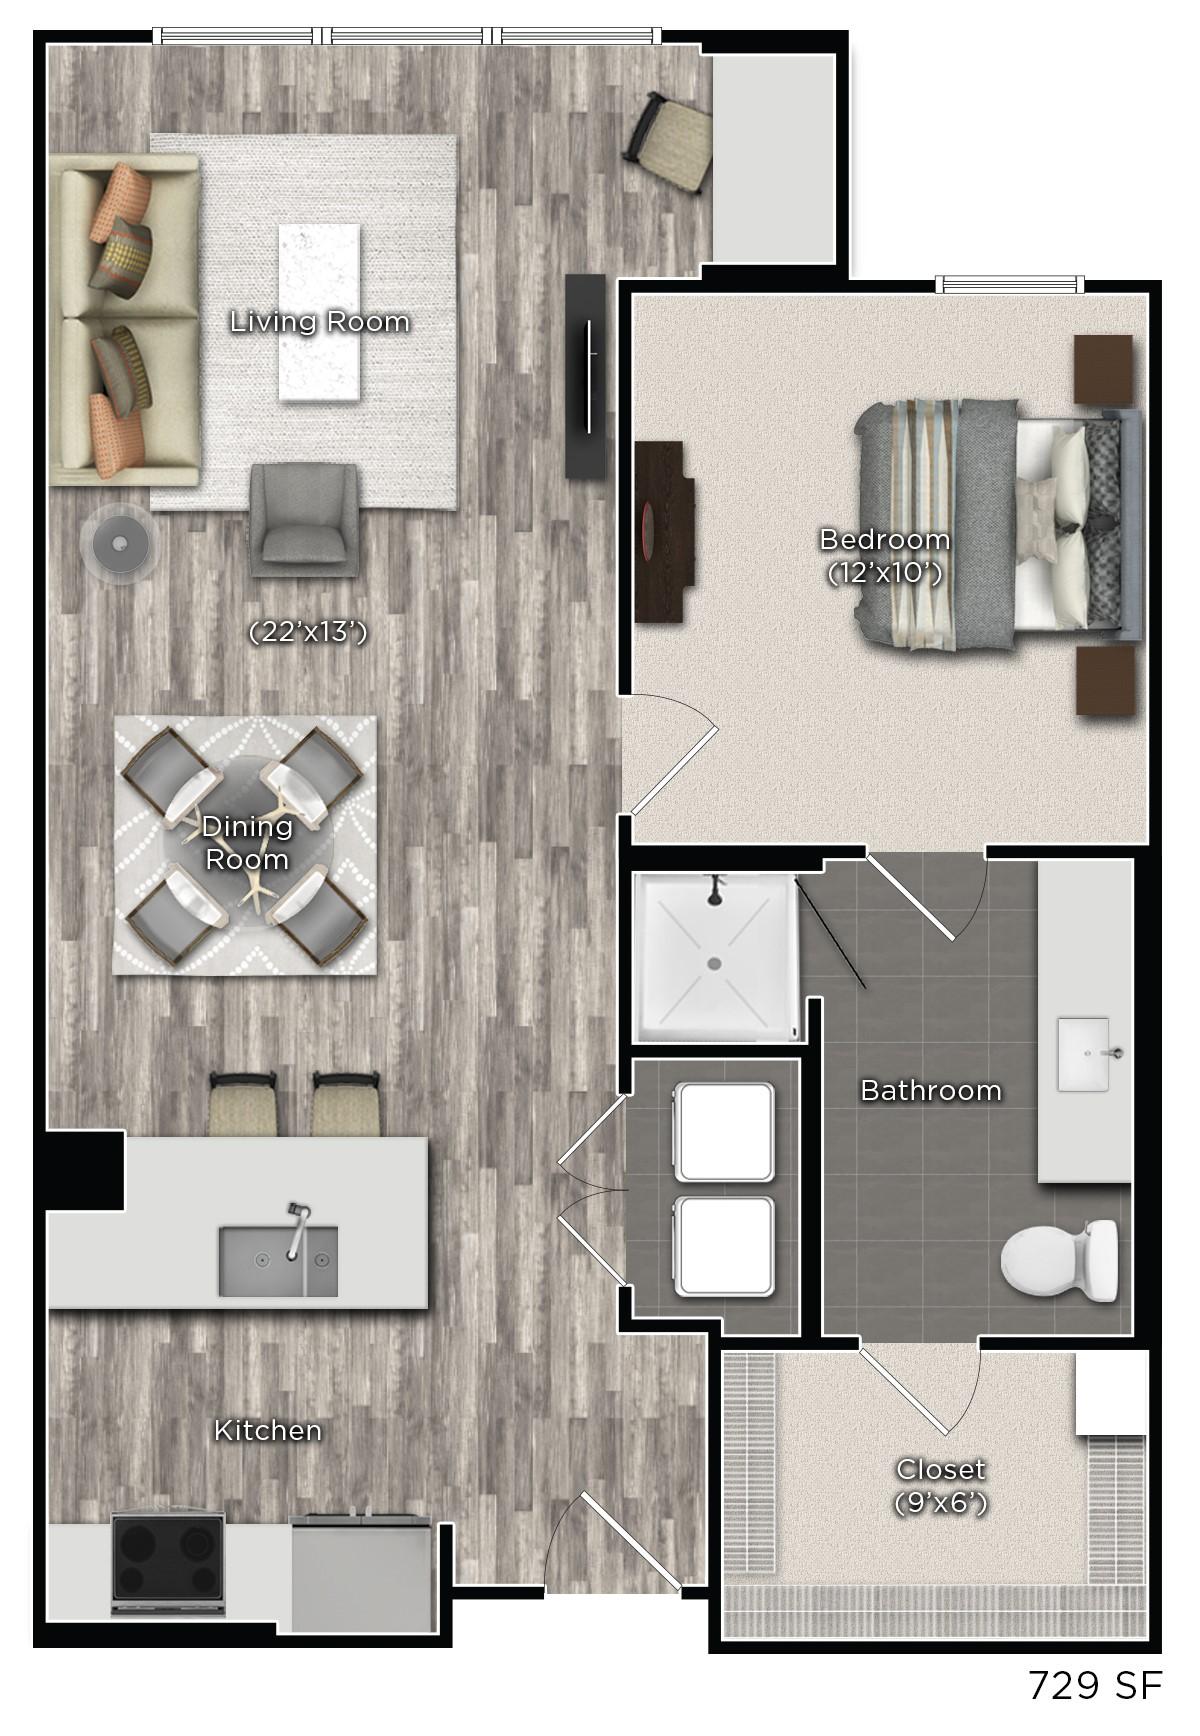 Tens on West - Floorplan - D